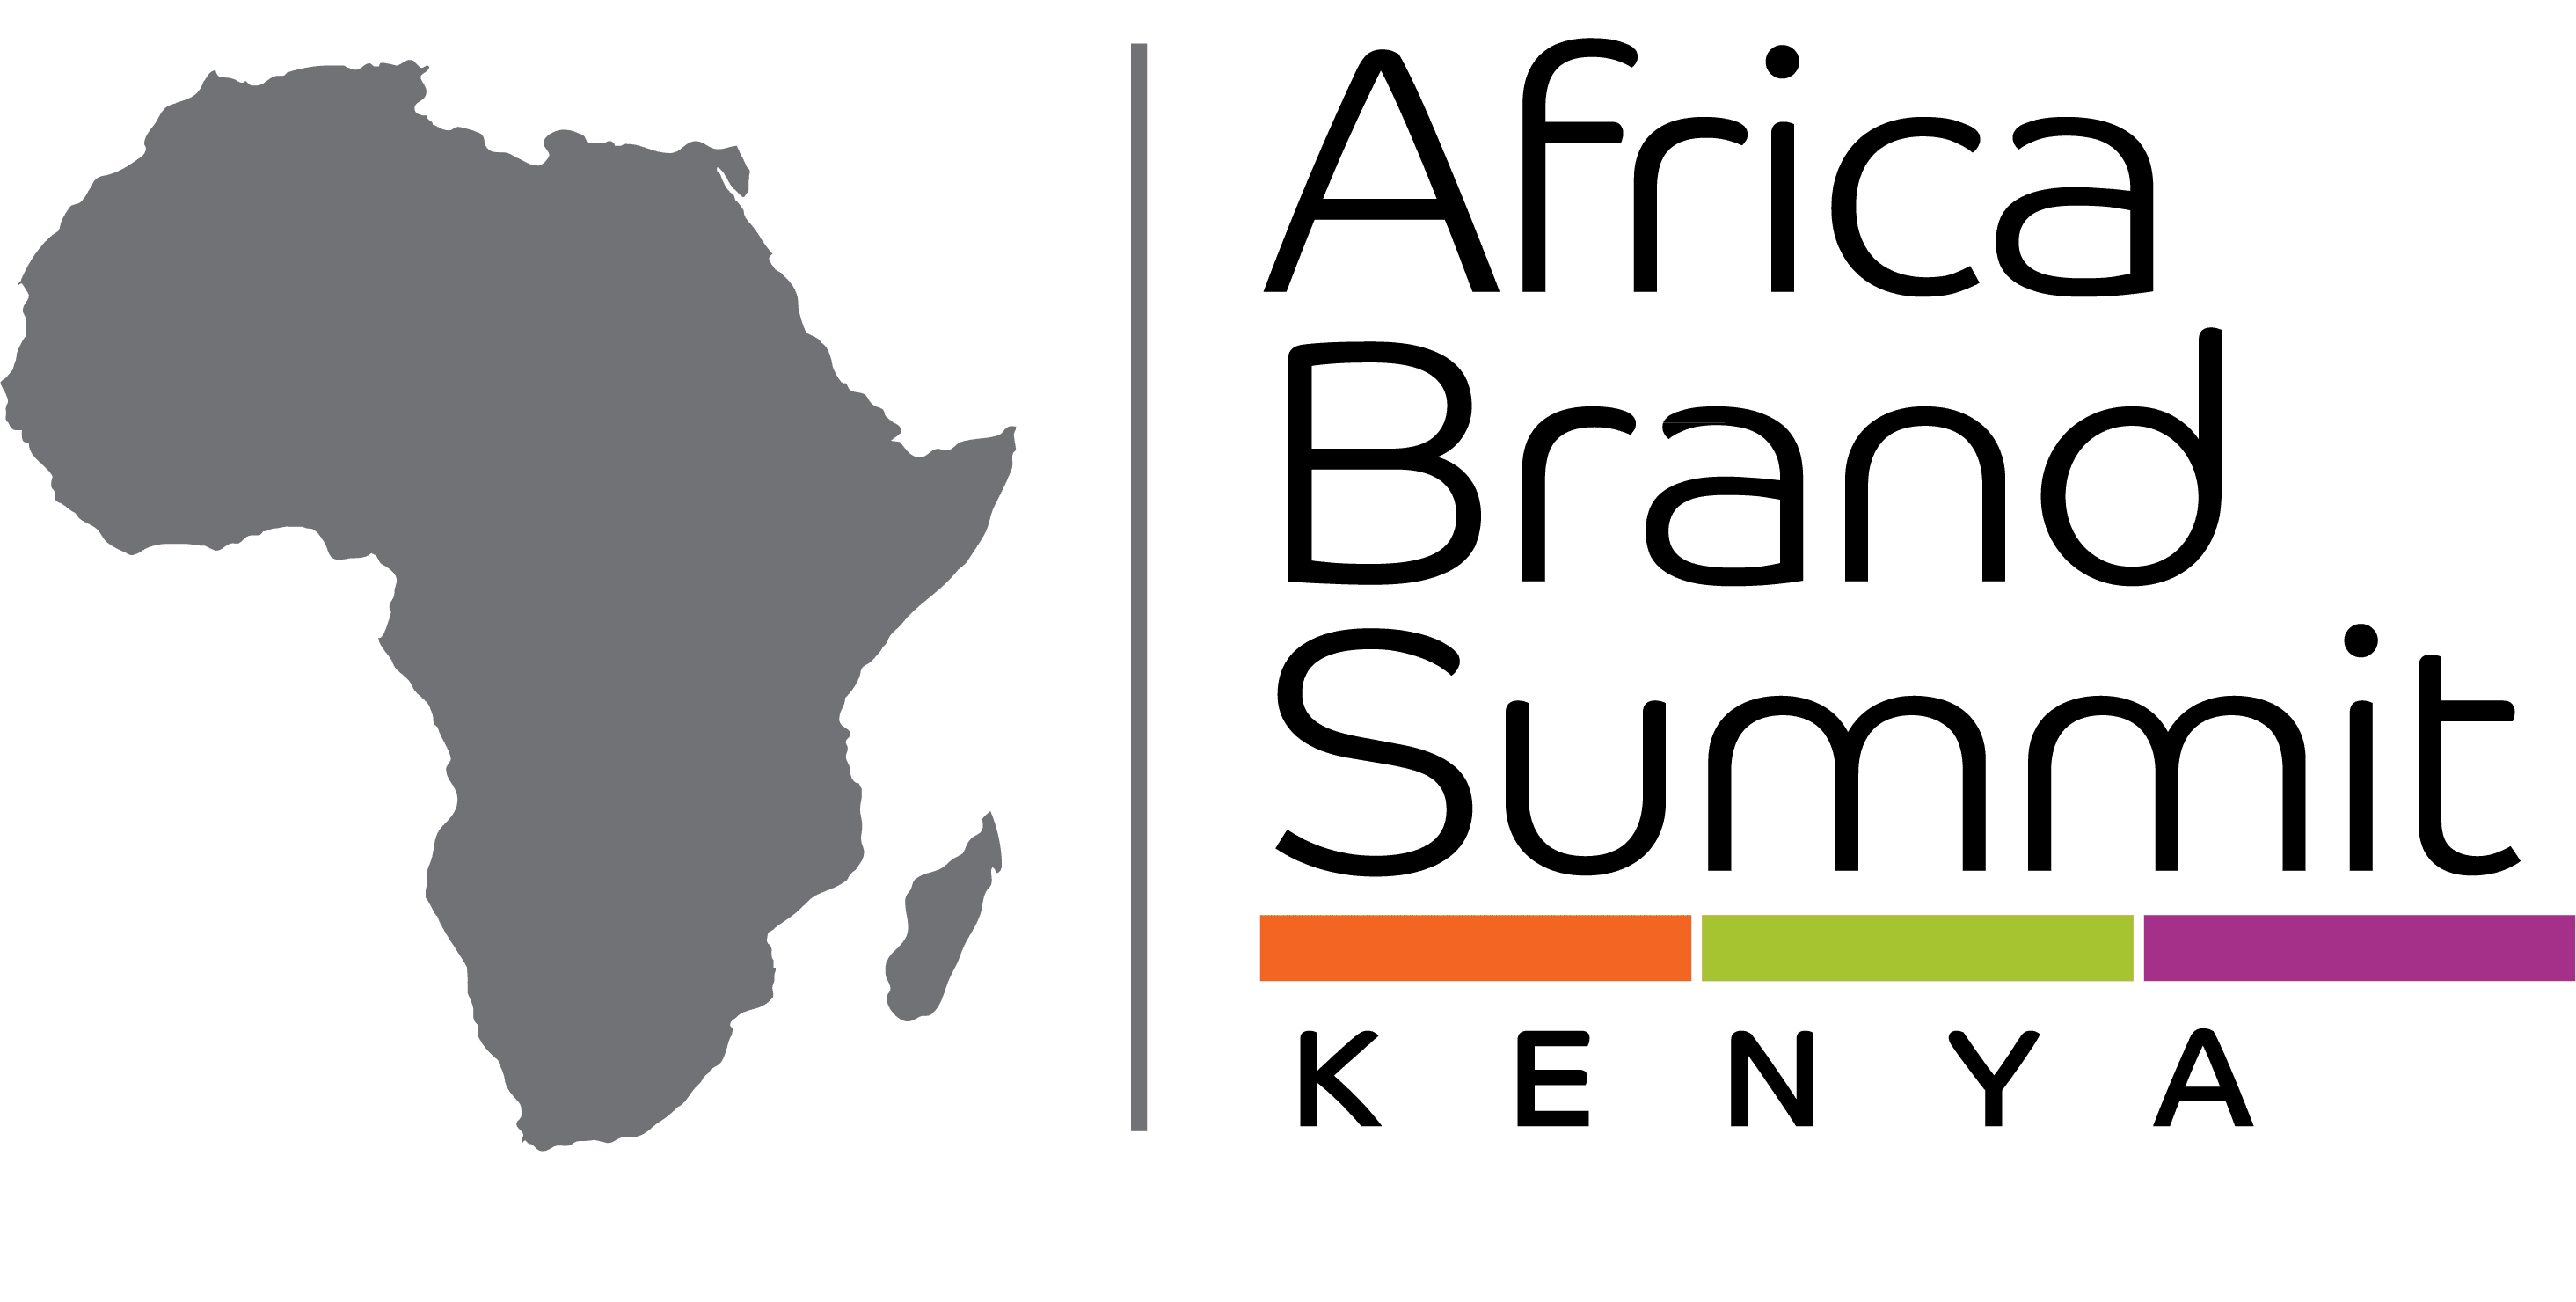 Africa Brand Summit in March to brainstorm sustainable development branding